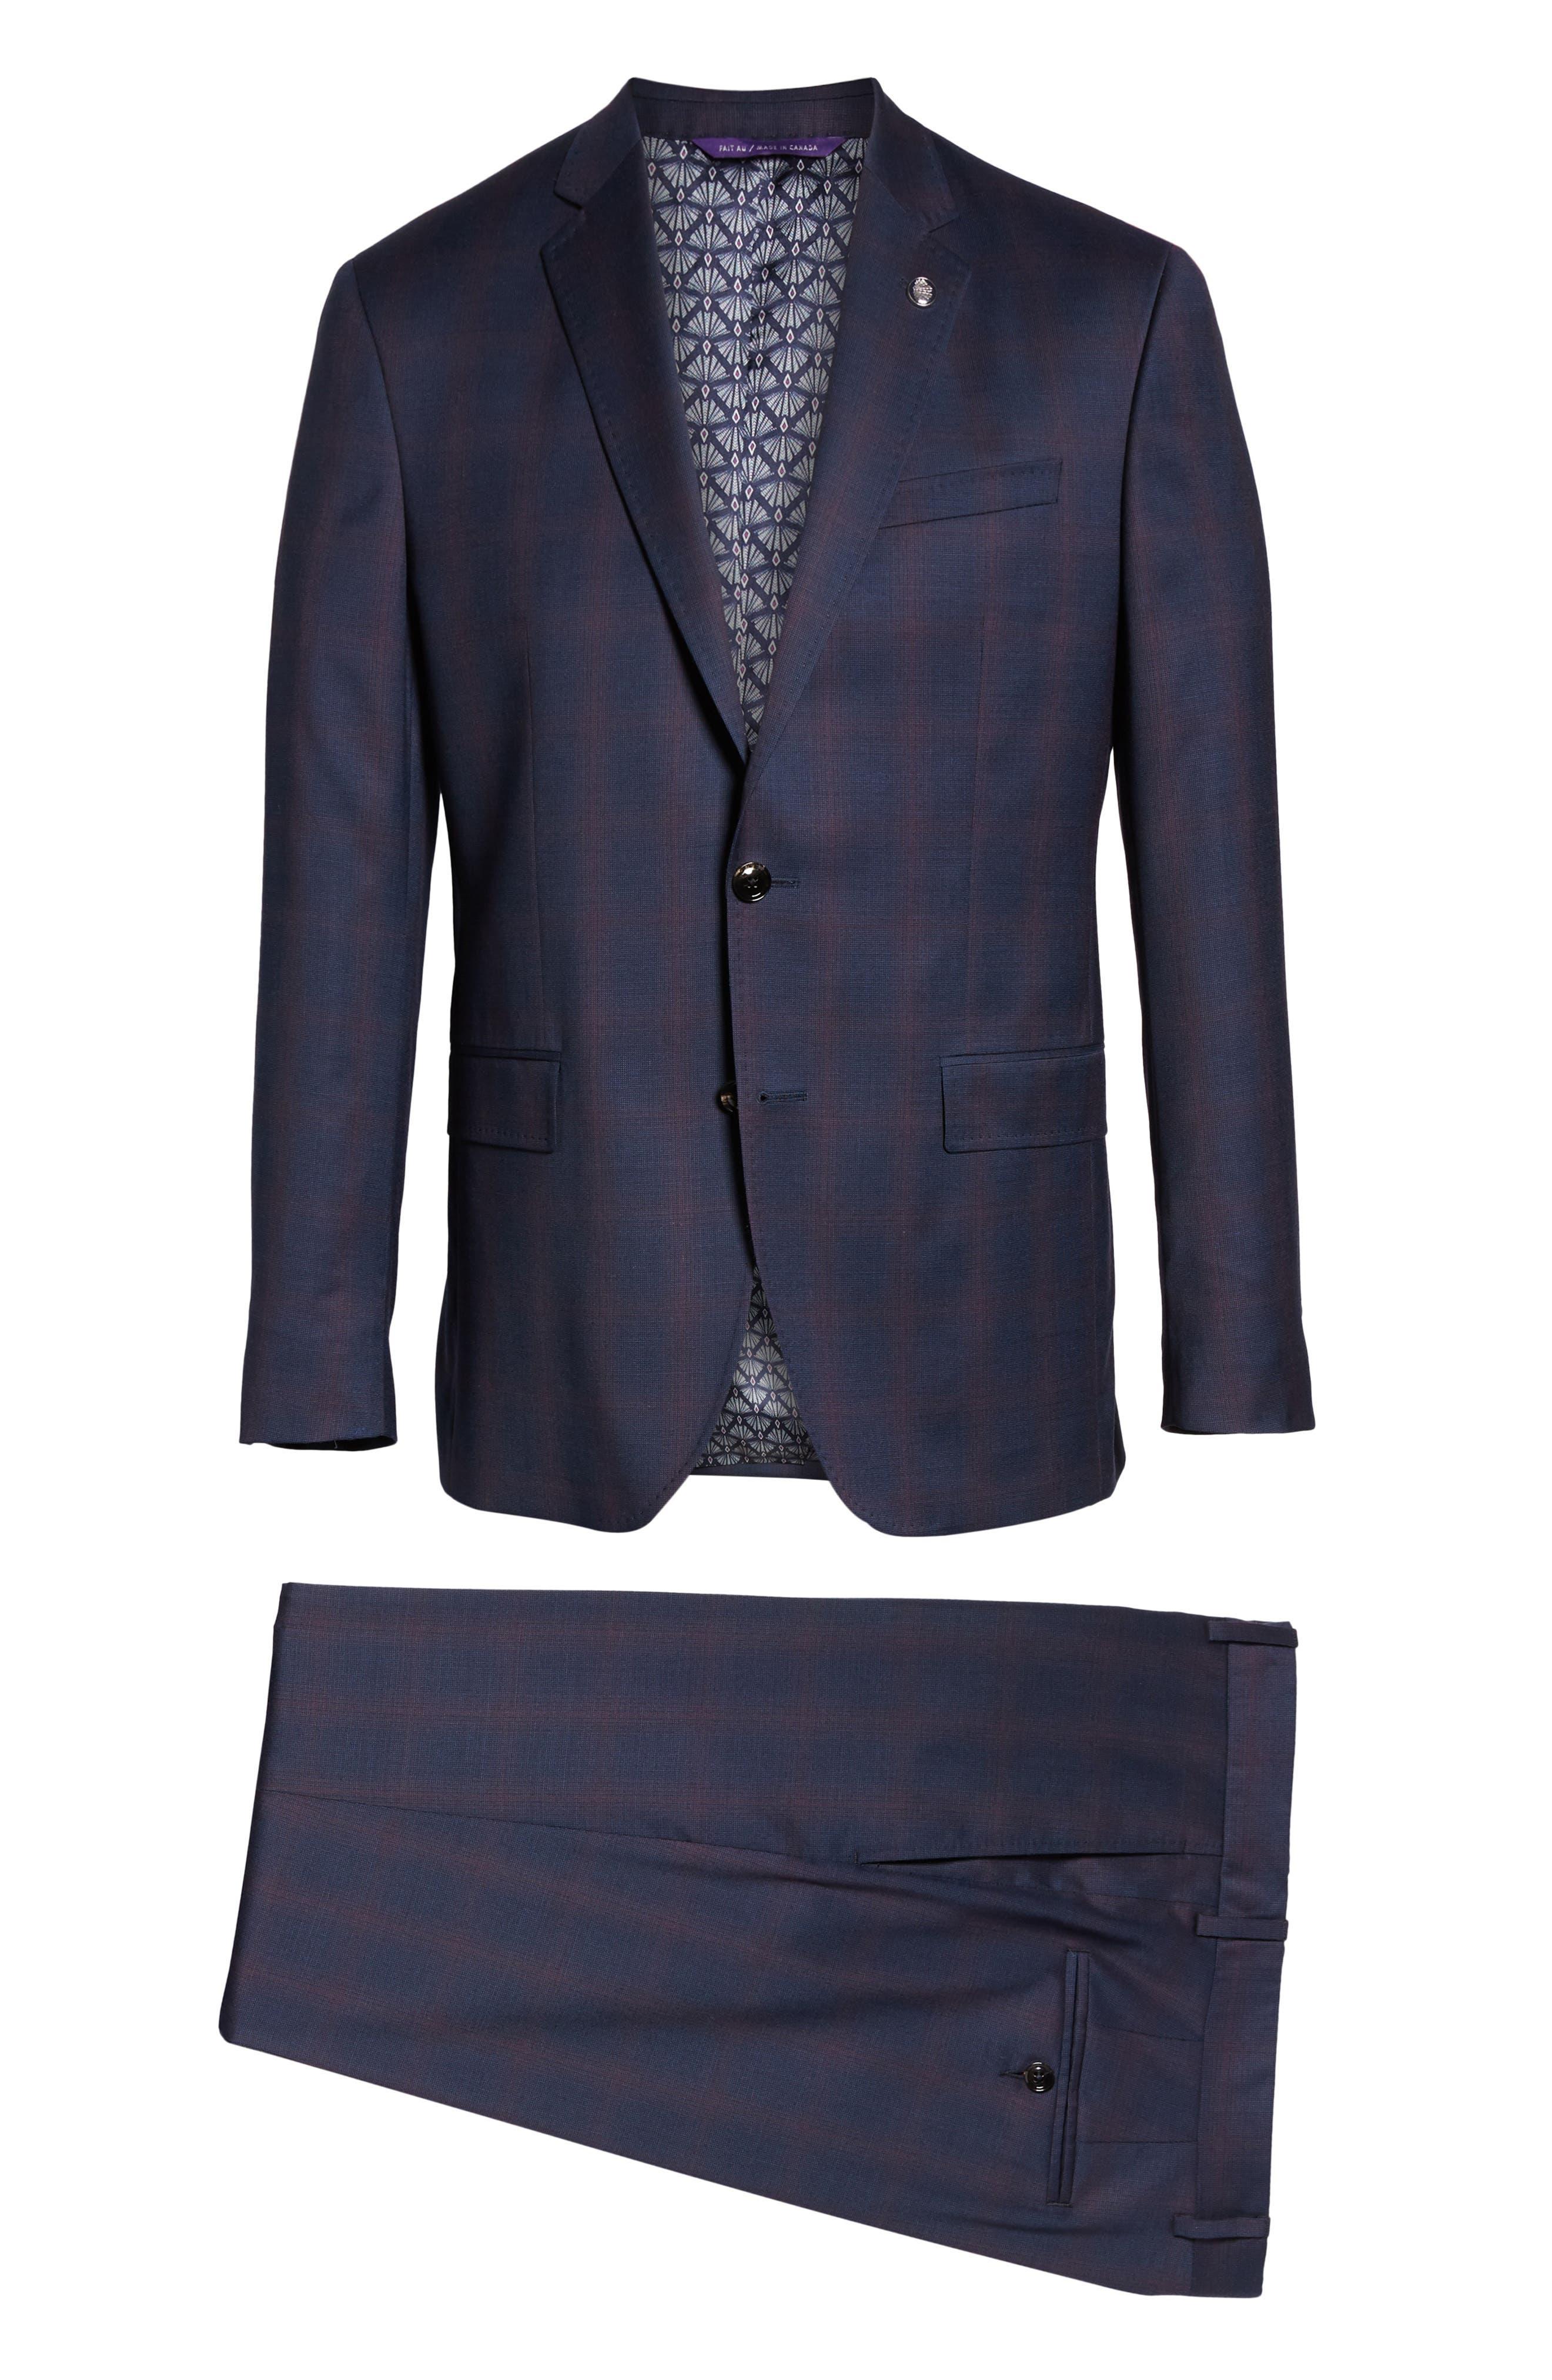 TED BAKER LONDON,                             Roger Slim Fit Plaid Wool Suit,                             Alternate thumbnail 8, color,                             NAVY